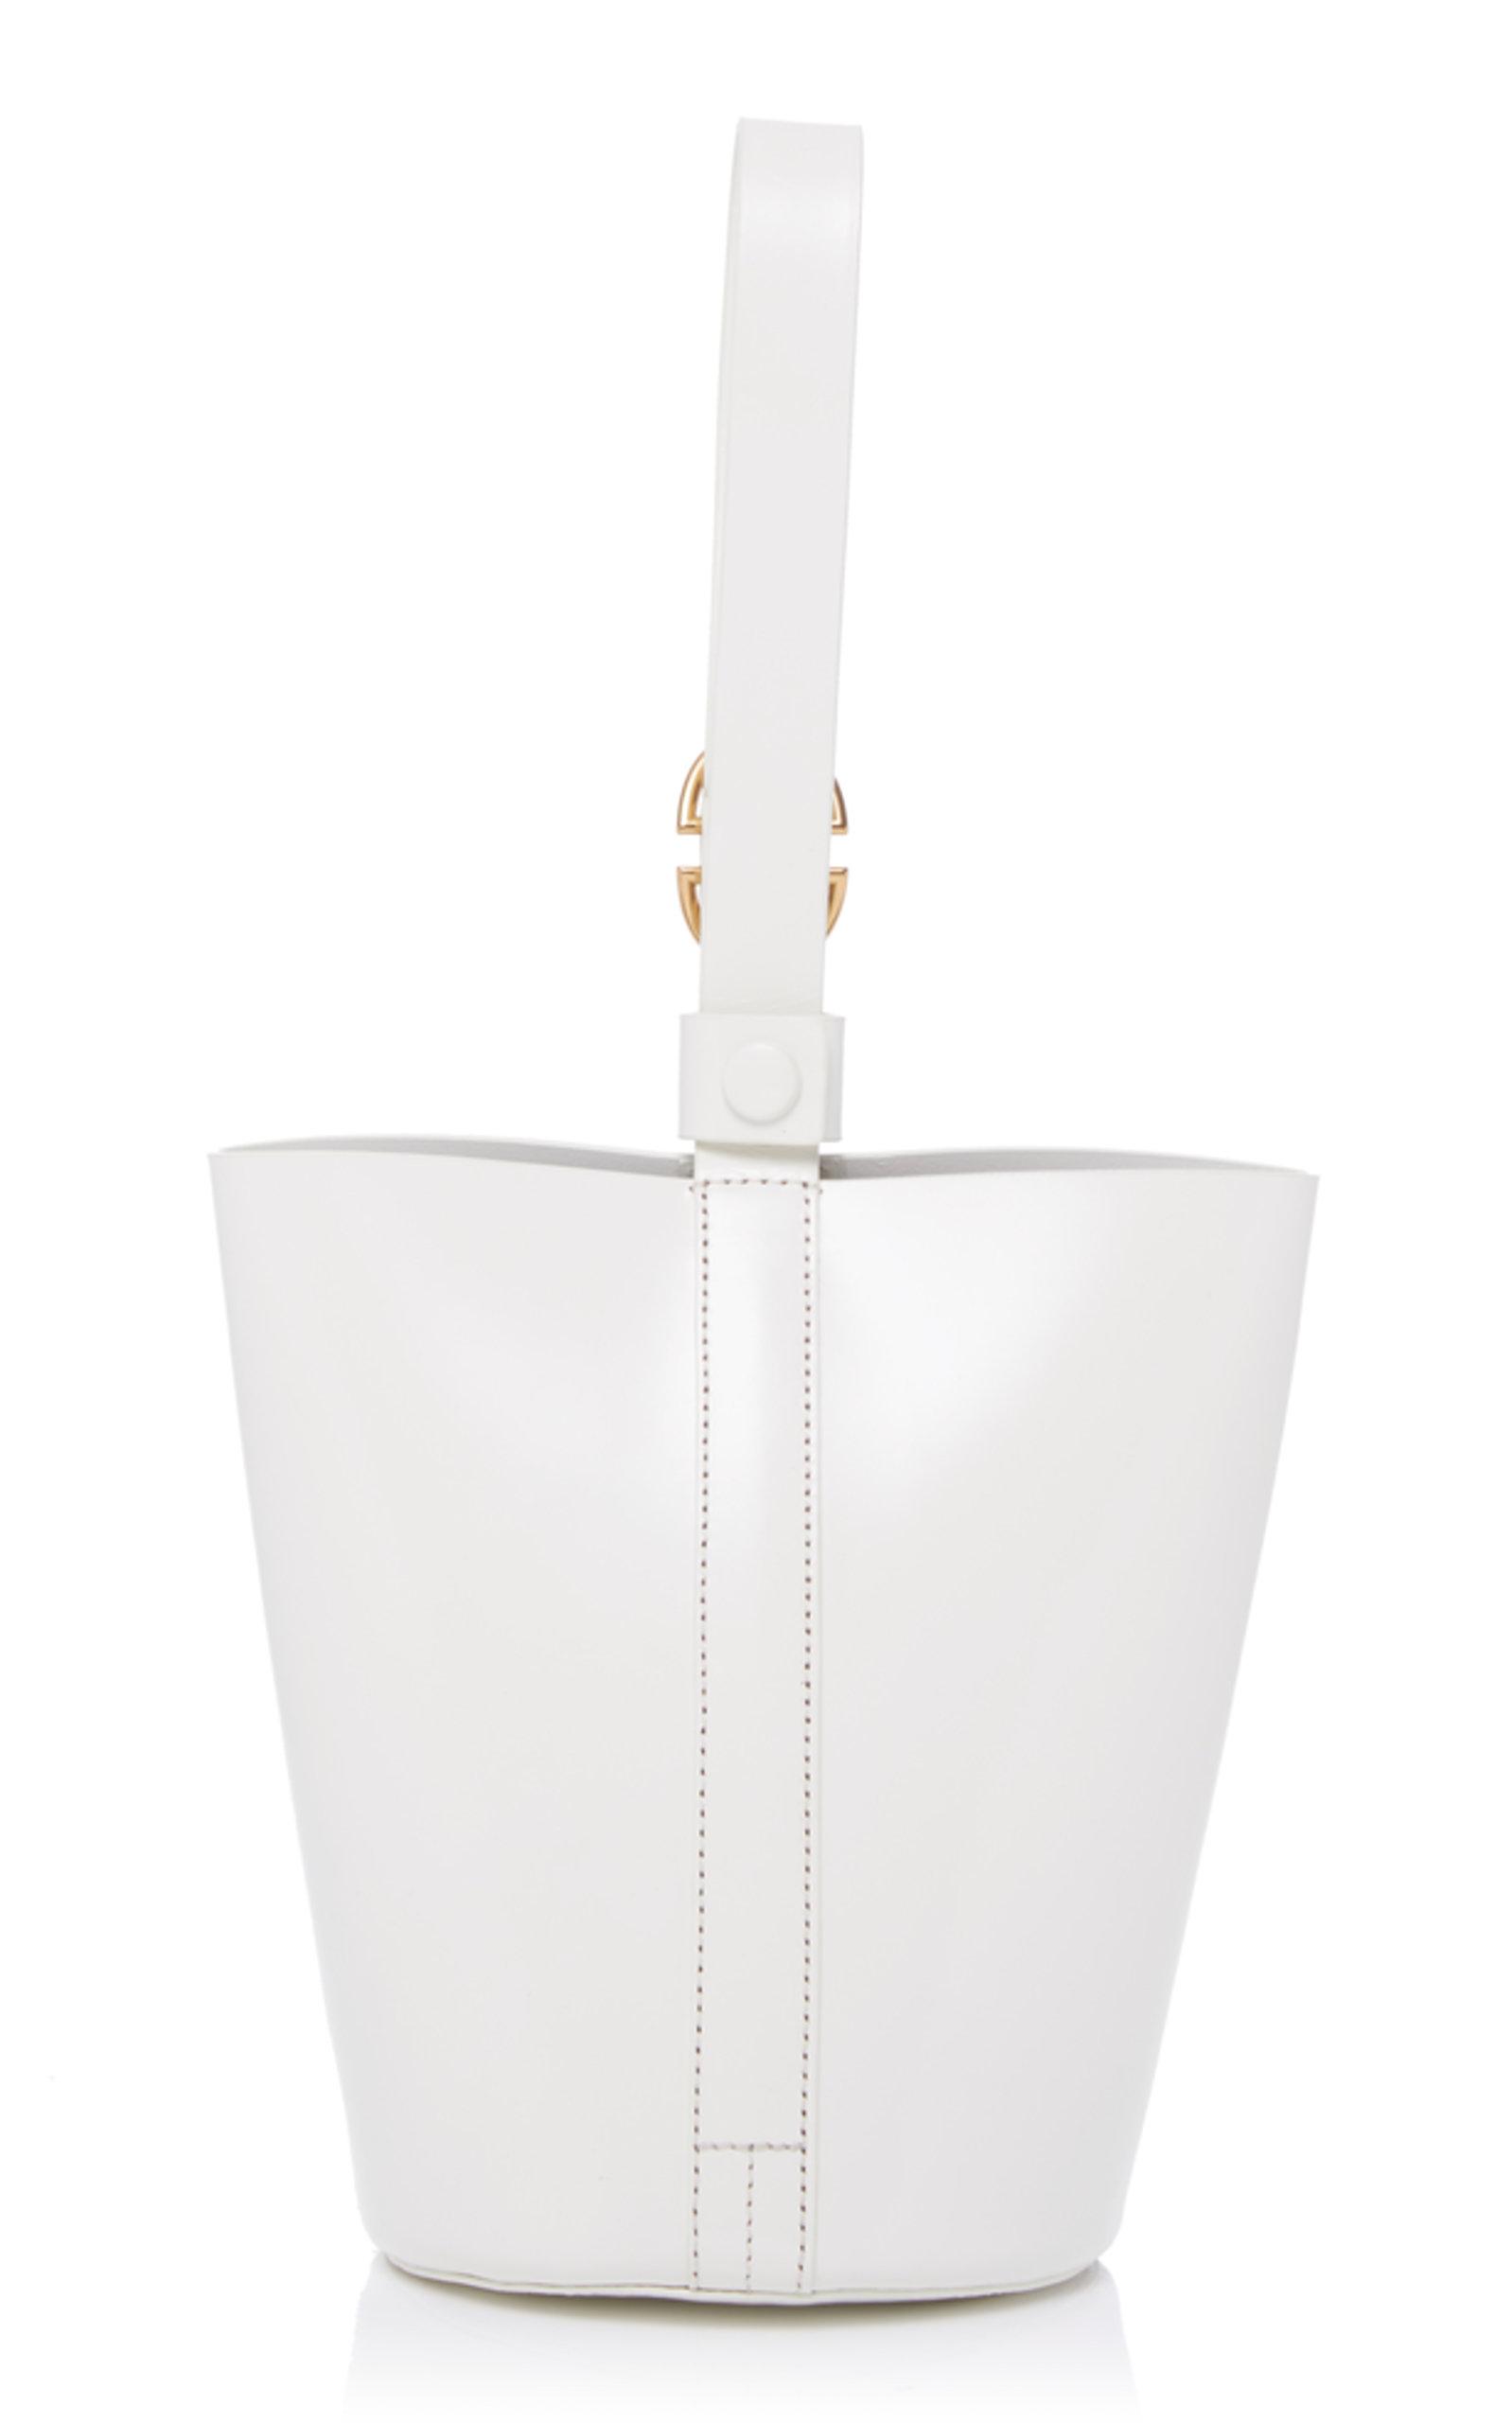 Trademark Small Western Bucket RGPGuFrMBP